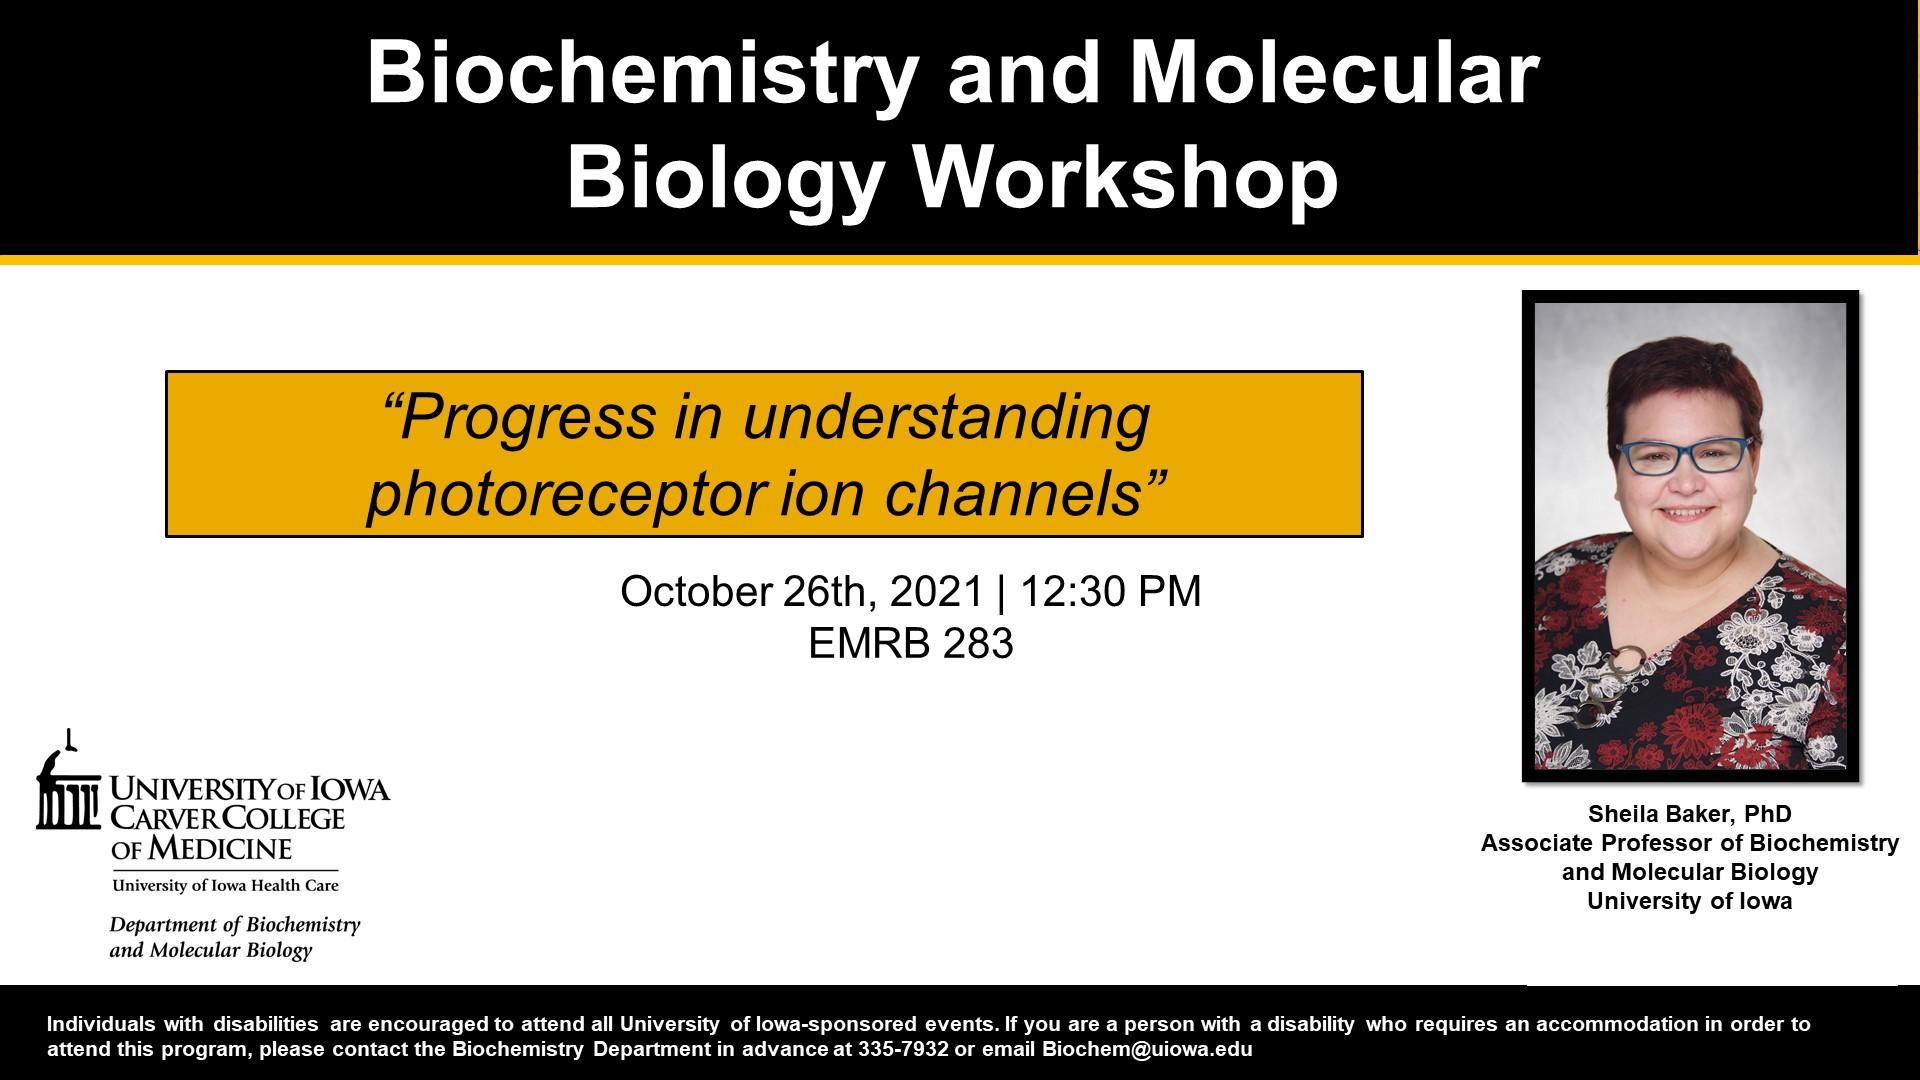 Biochemistry Workshop: Sheila Baker promotional image